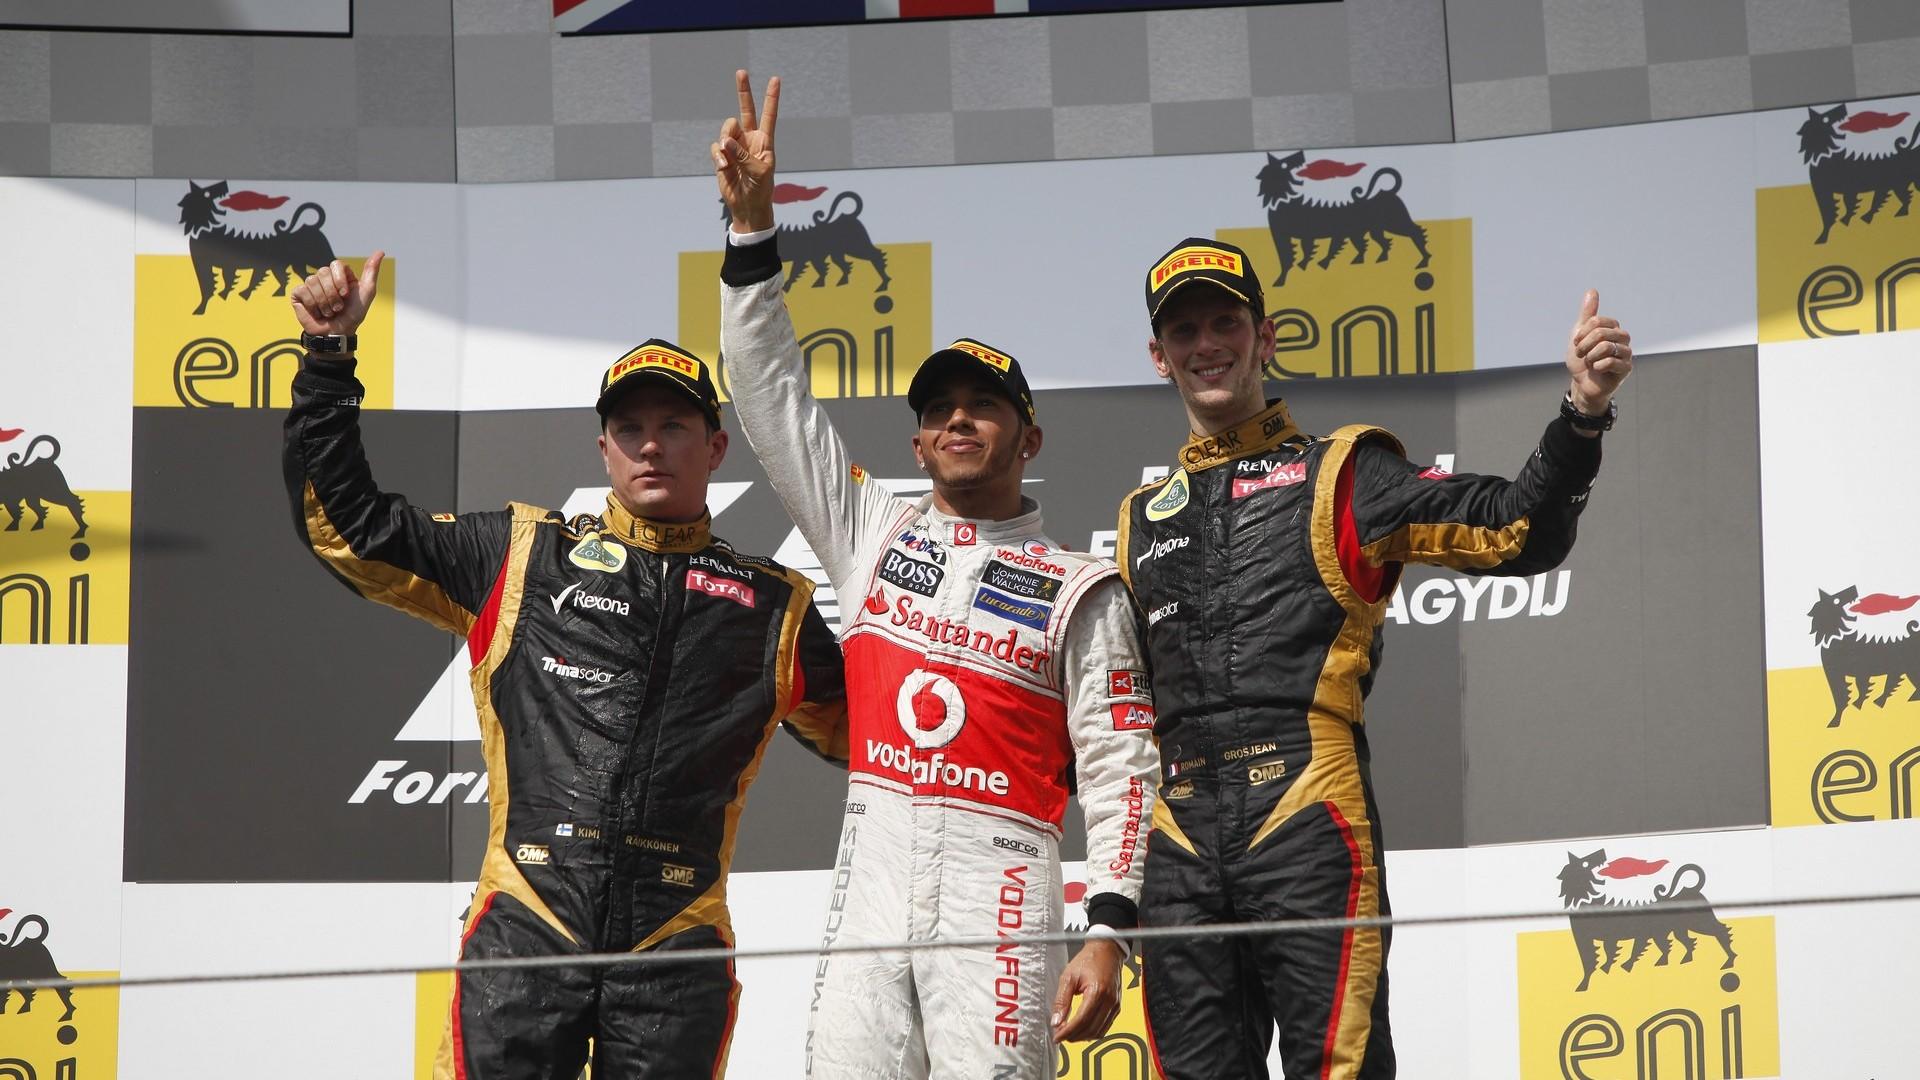 2019 Hungarian Grand Prix